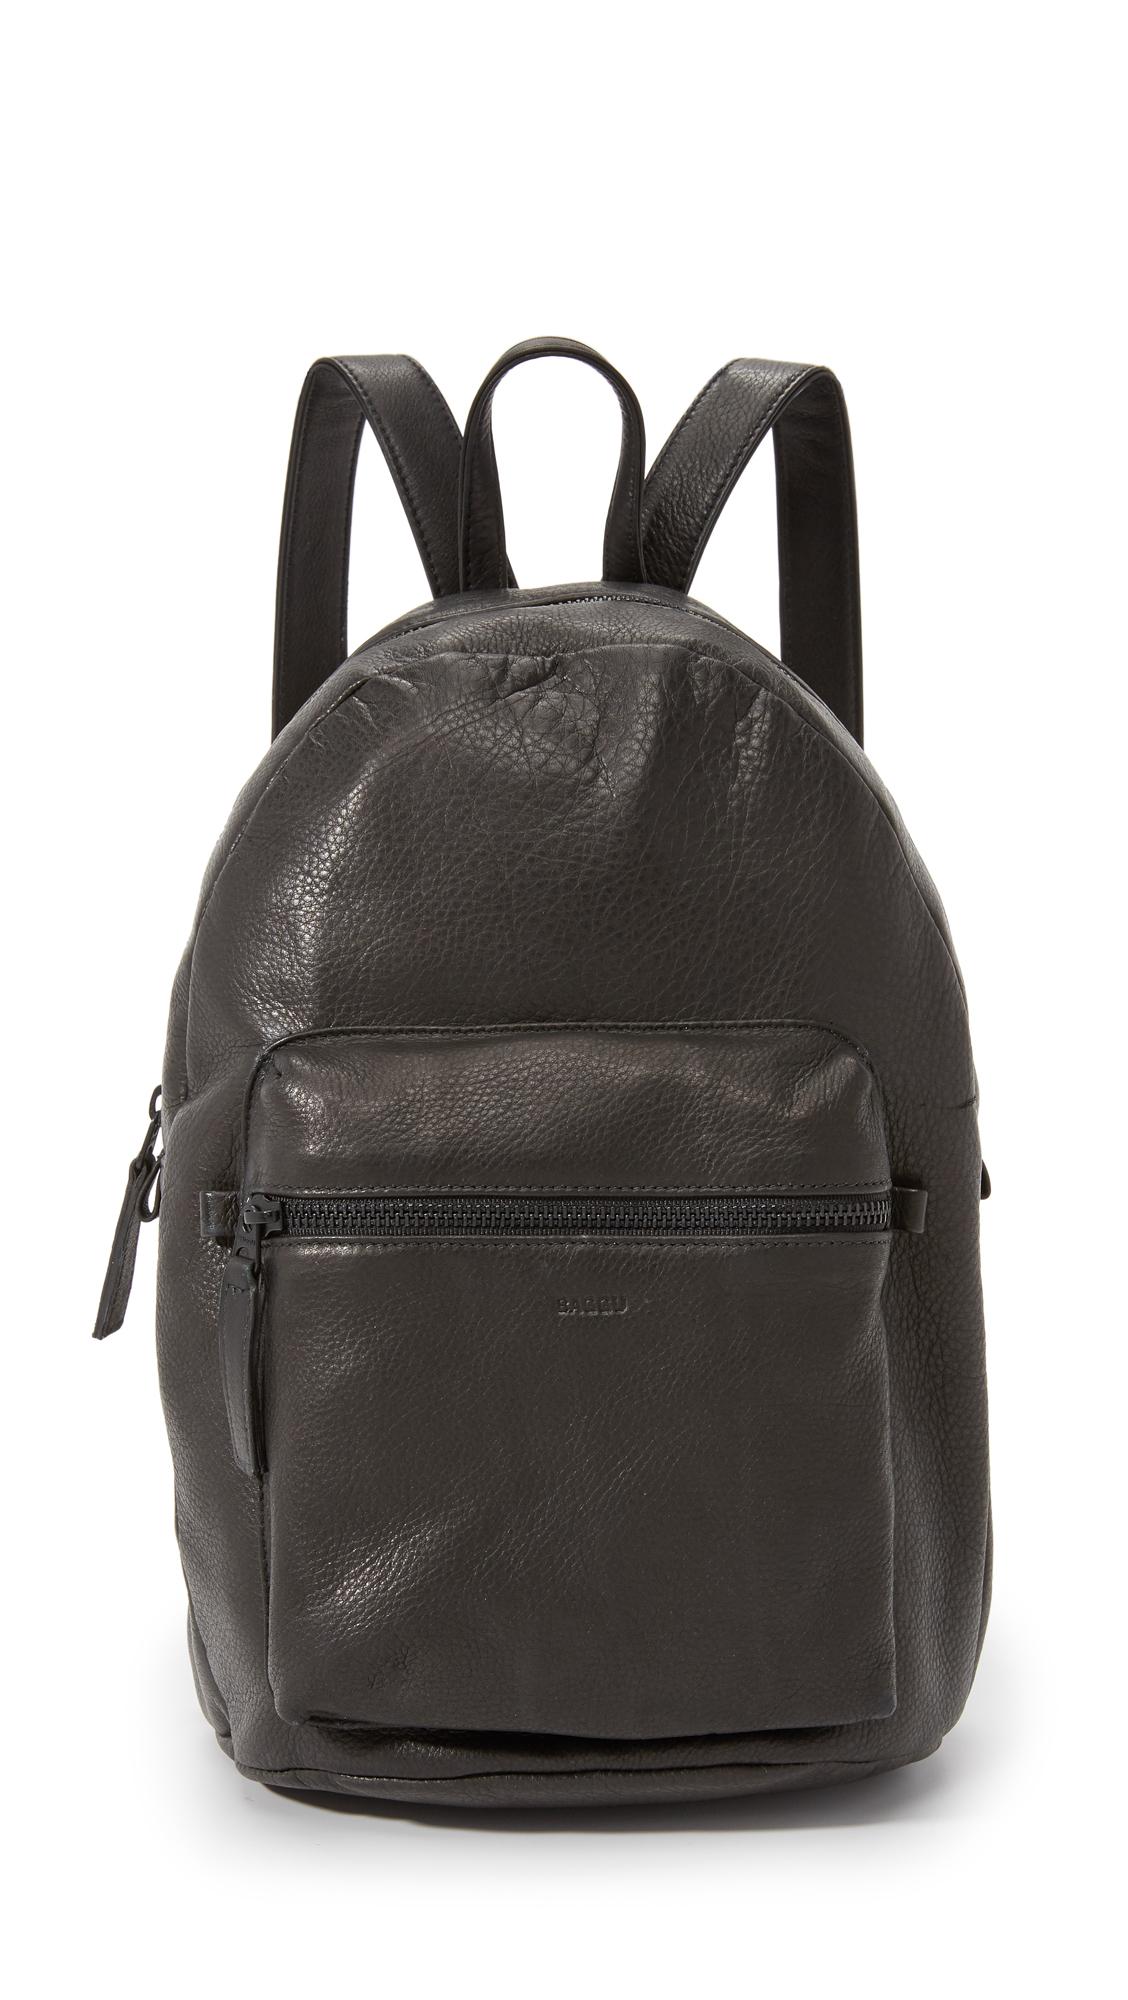 Baggu Leather Backpack Shopbop